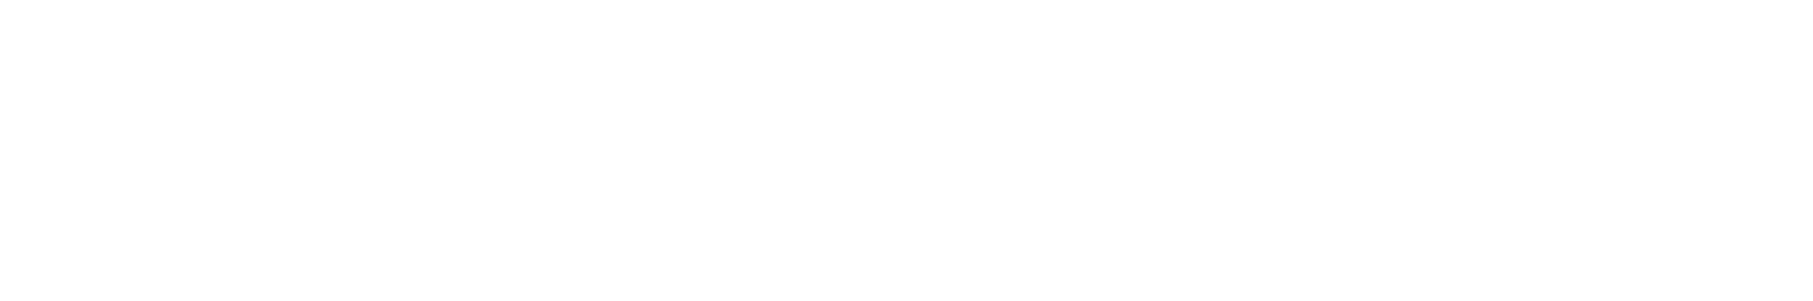 greenkalamata logo